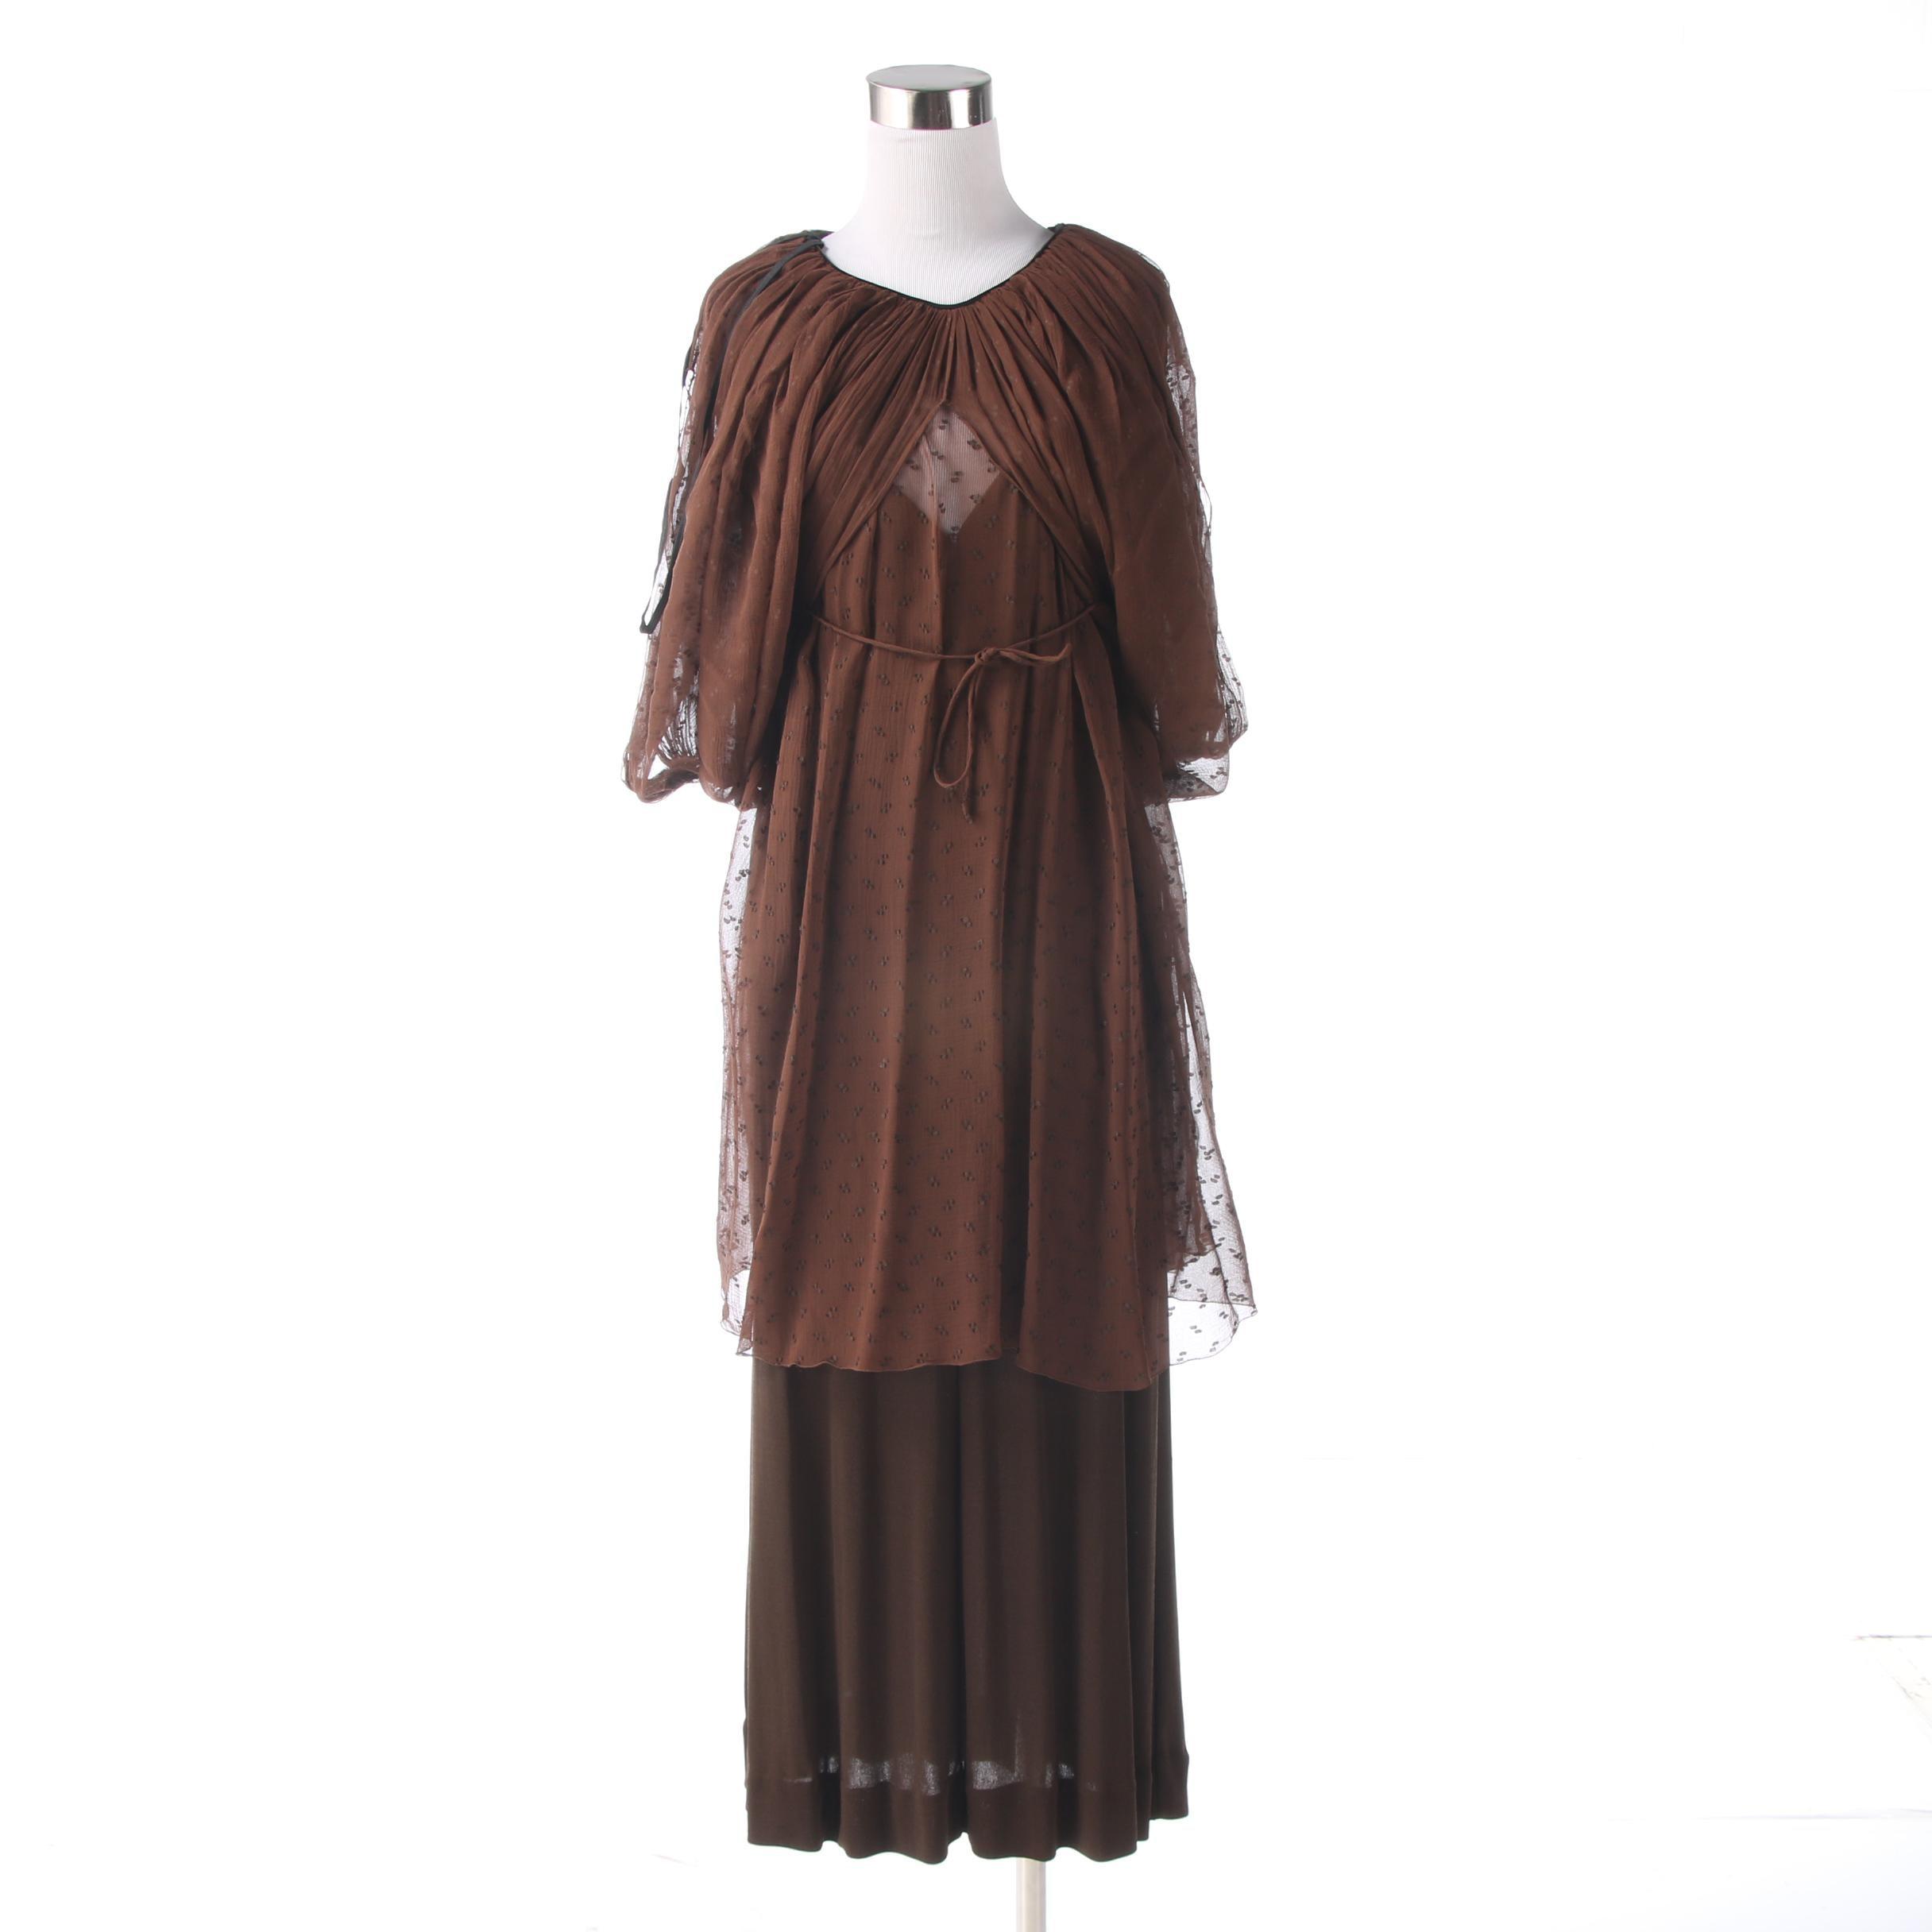 Tracy Mills Matte Bronze Slip Dress with Sheer Batwing Overlay